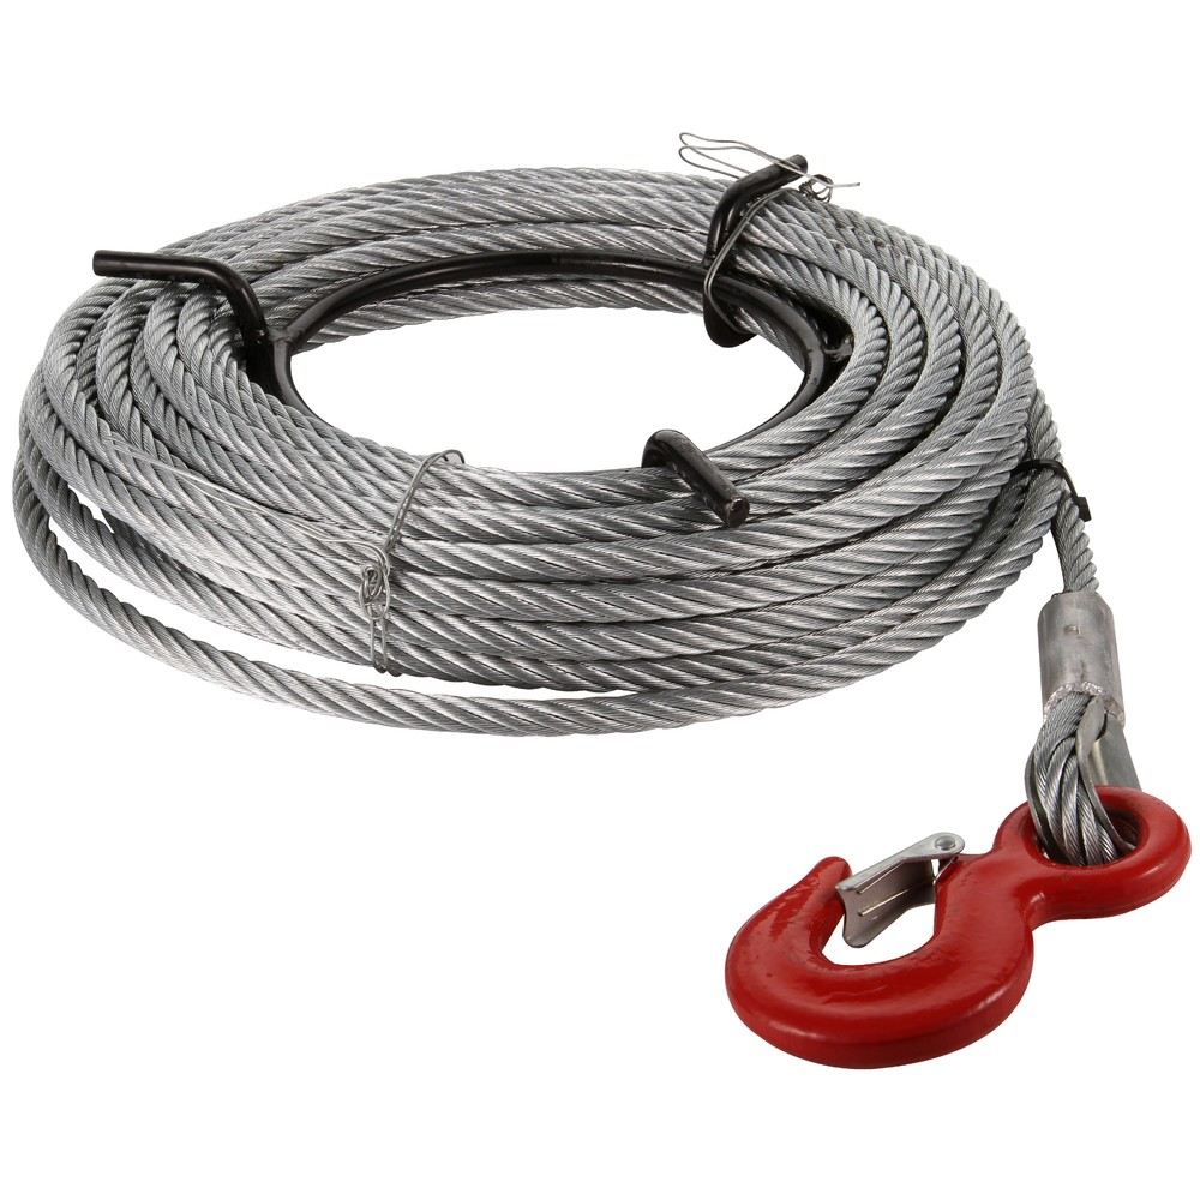 PULLING HOIST SPARE WIRE 1,6T/20M W HOOK TK1600-1 - IKH